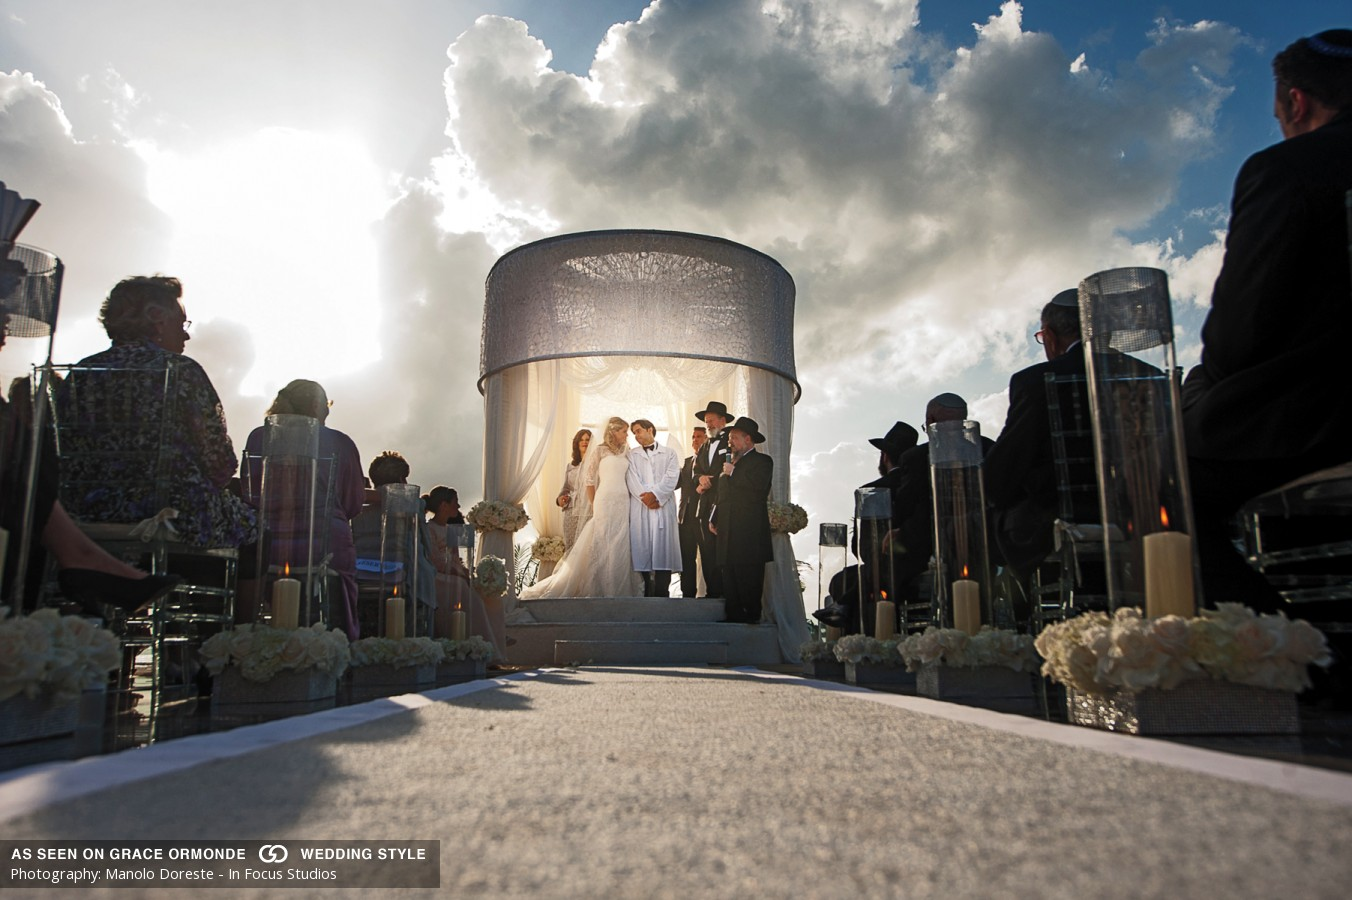 manolo-doreste-wedding-ss14-008.jpg